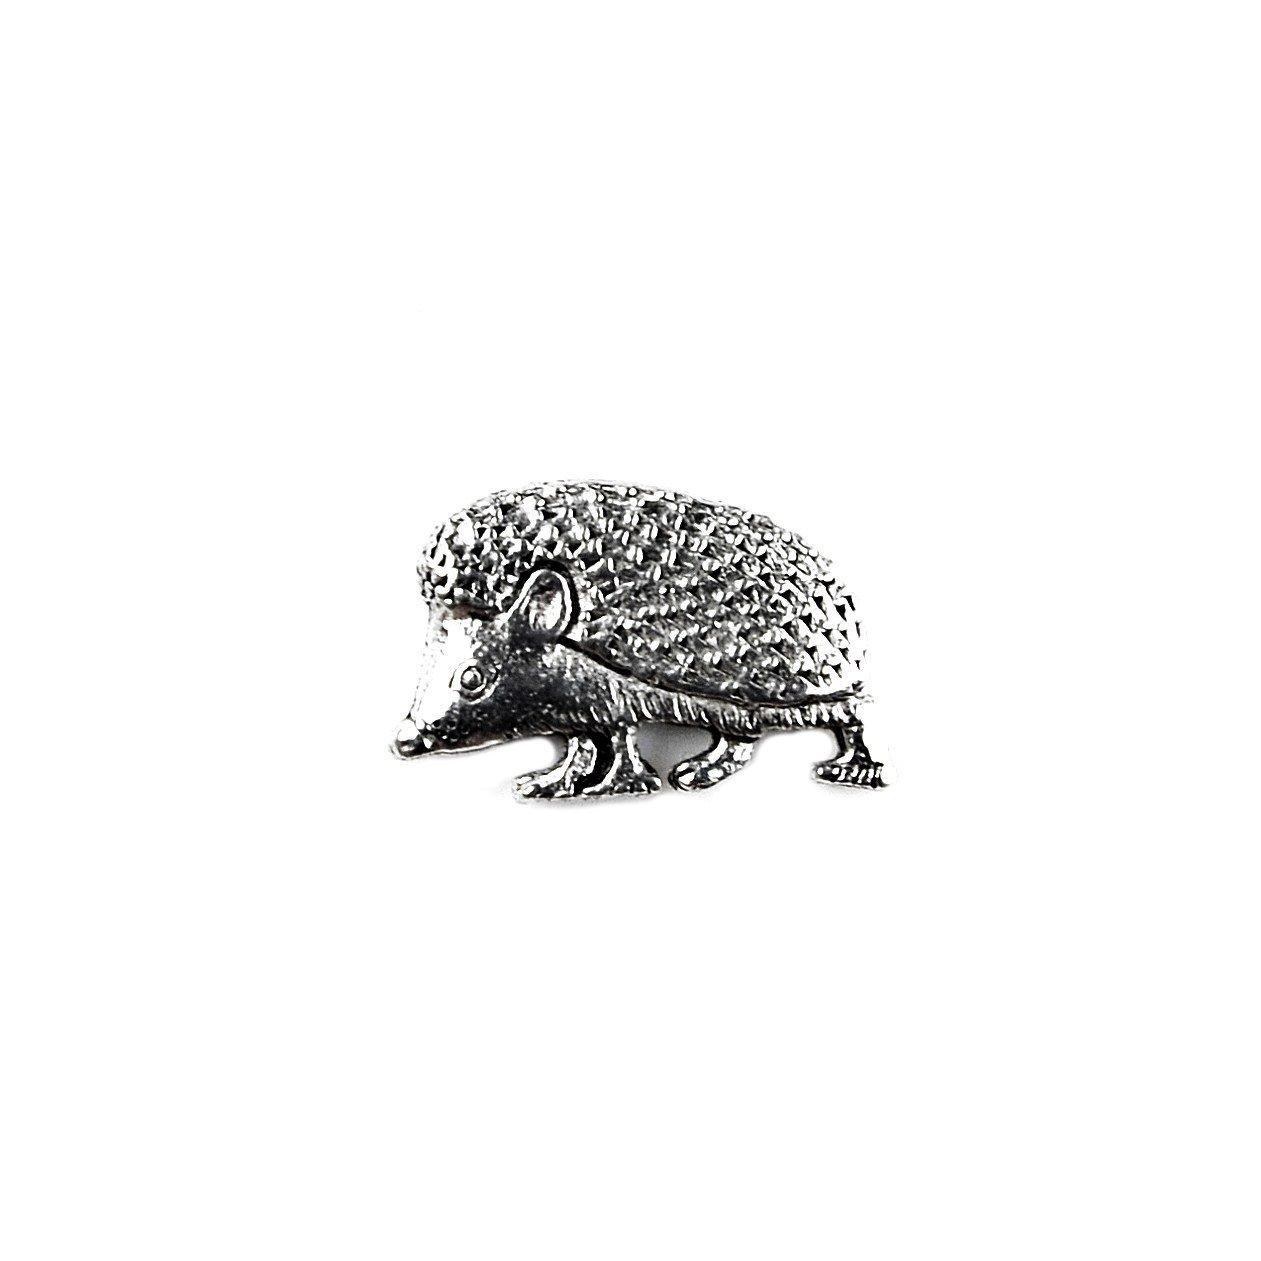 Quality Handcrafts Guaranteed Hedgehog Lapel Pin